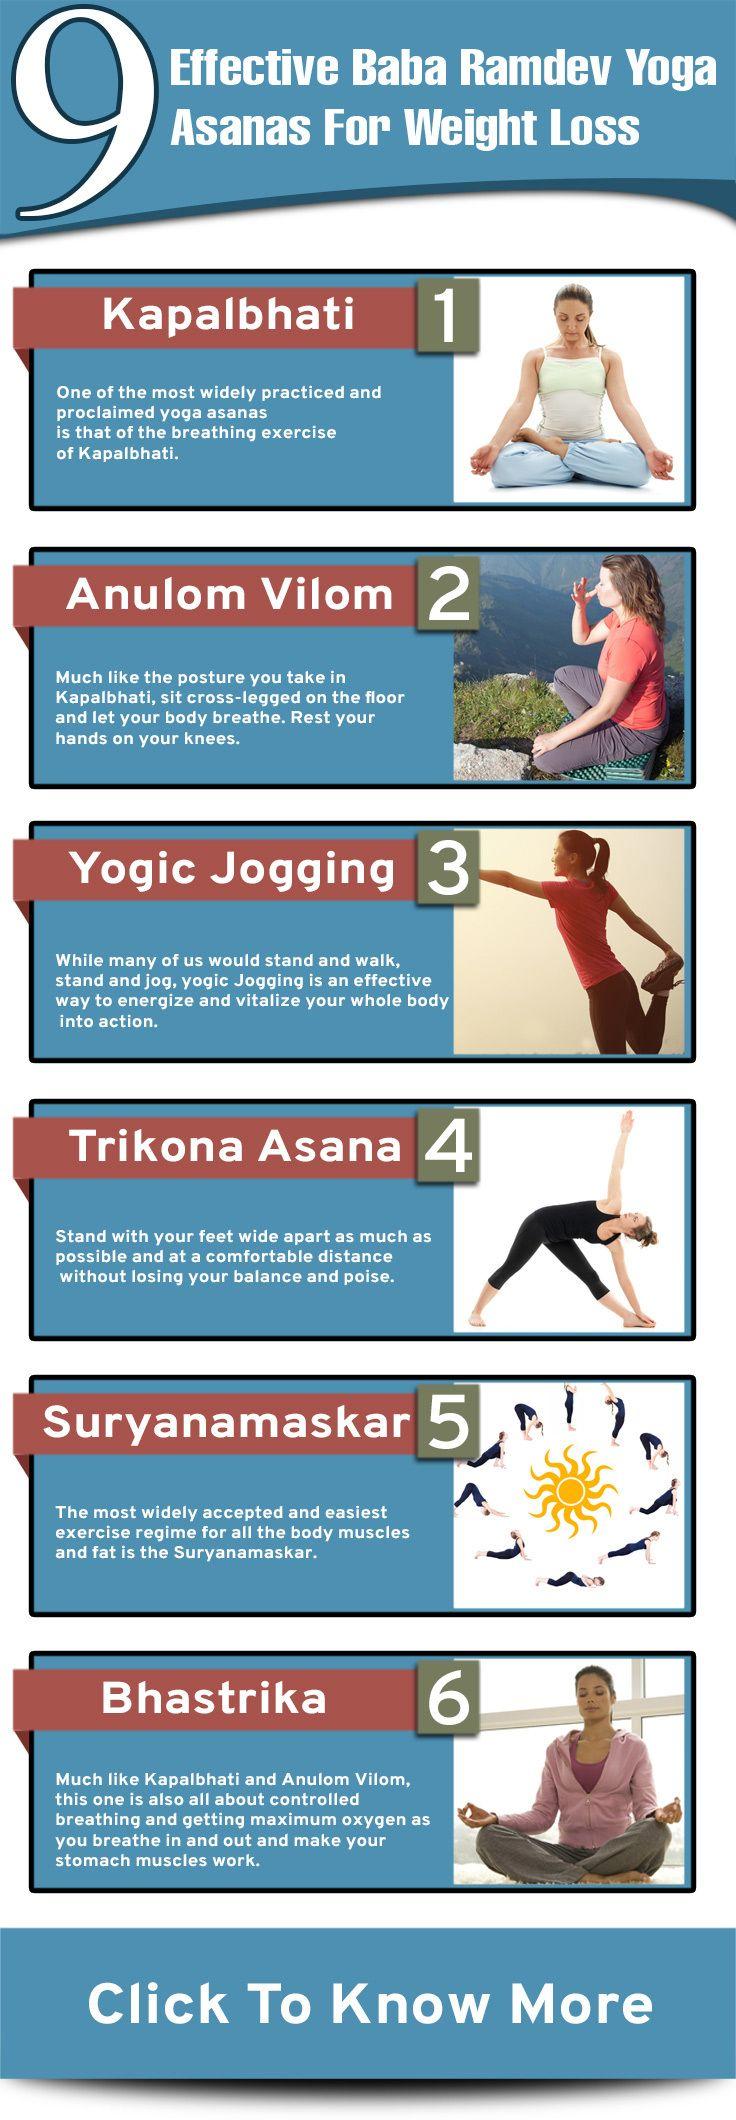 9 Effective Baba Ramdev Yoga Asanas For Weight Loss